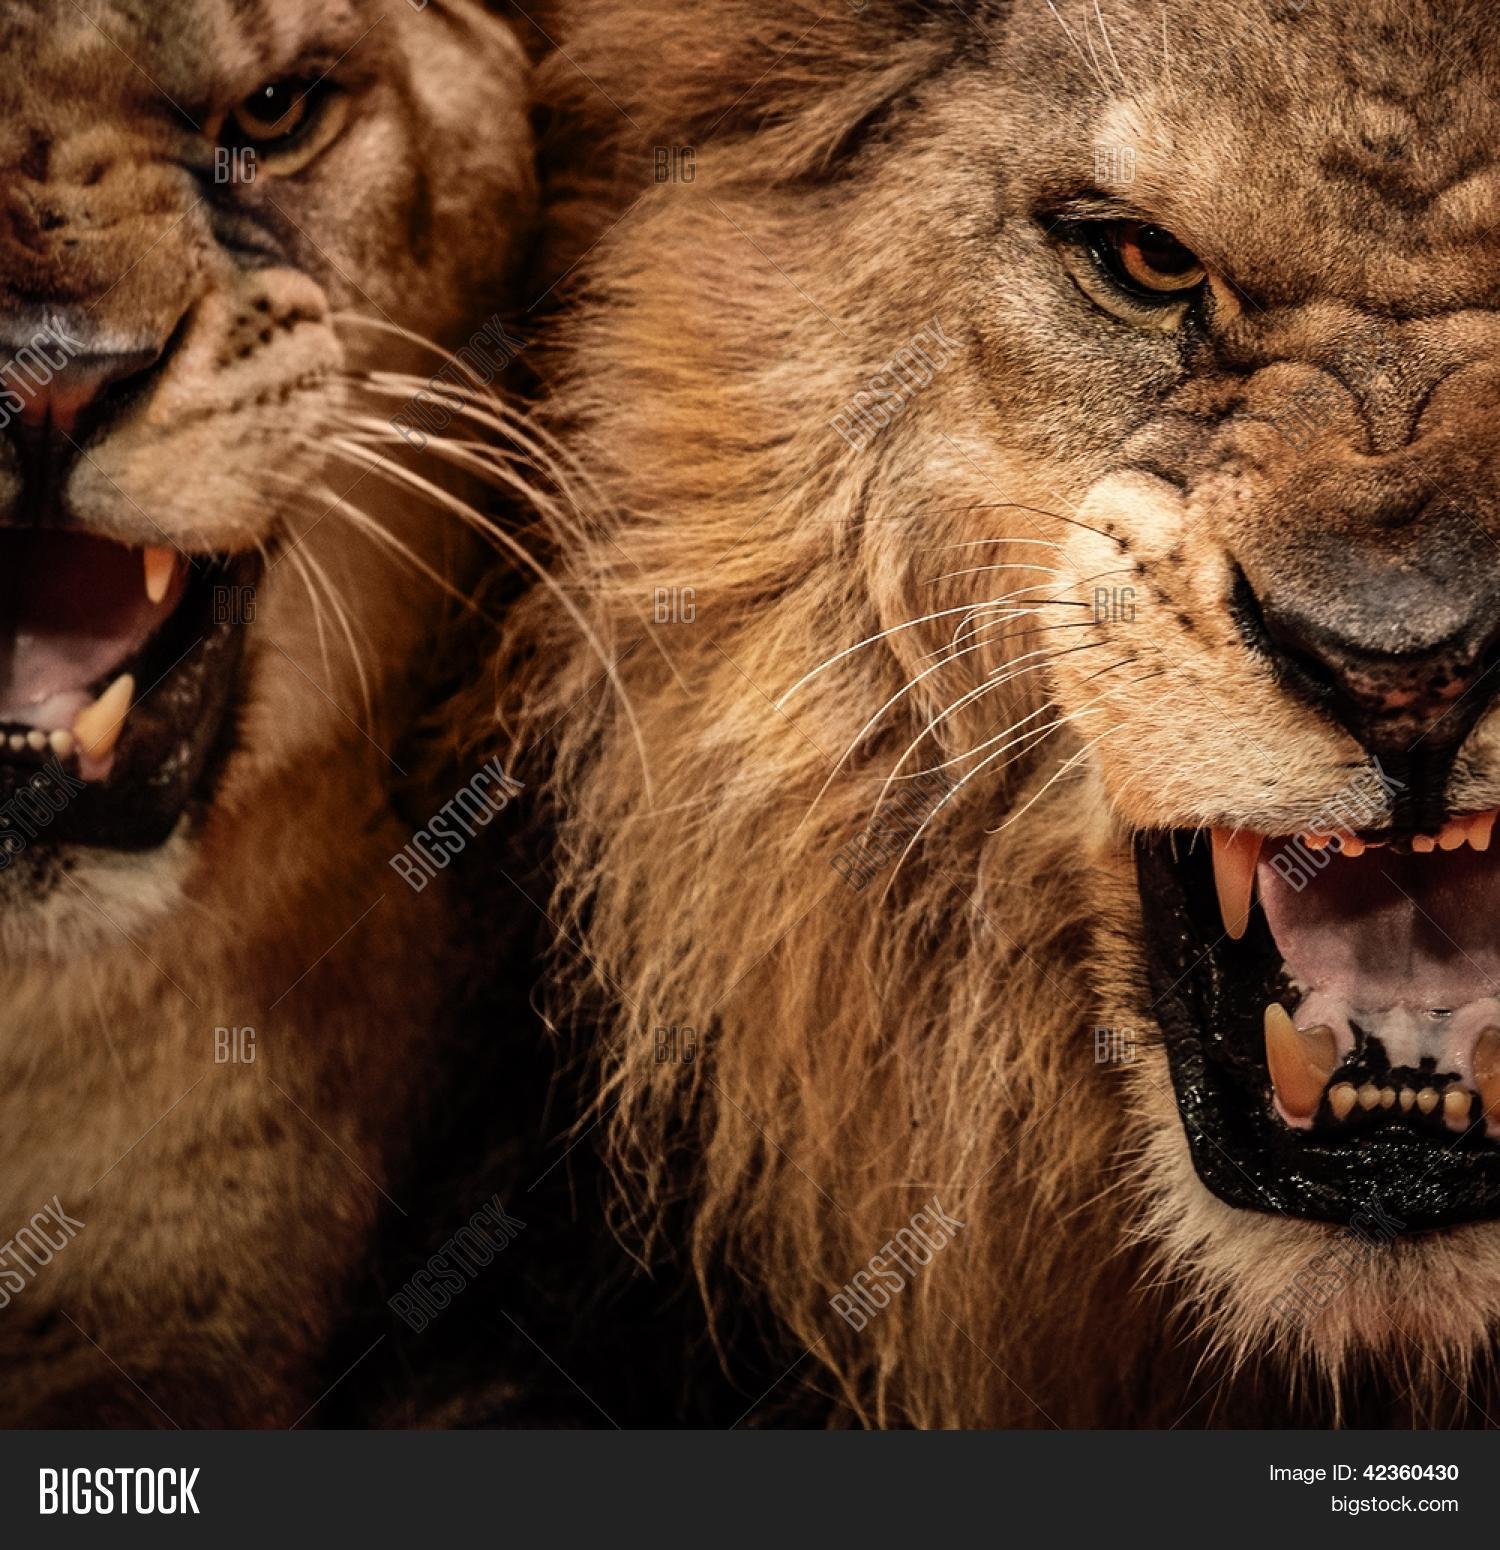 Close- Shot Two Roaring Lion Image & Photo   Bigstock - photo#49